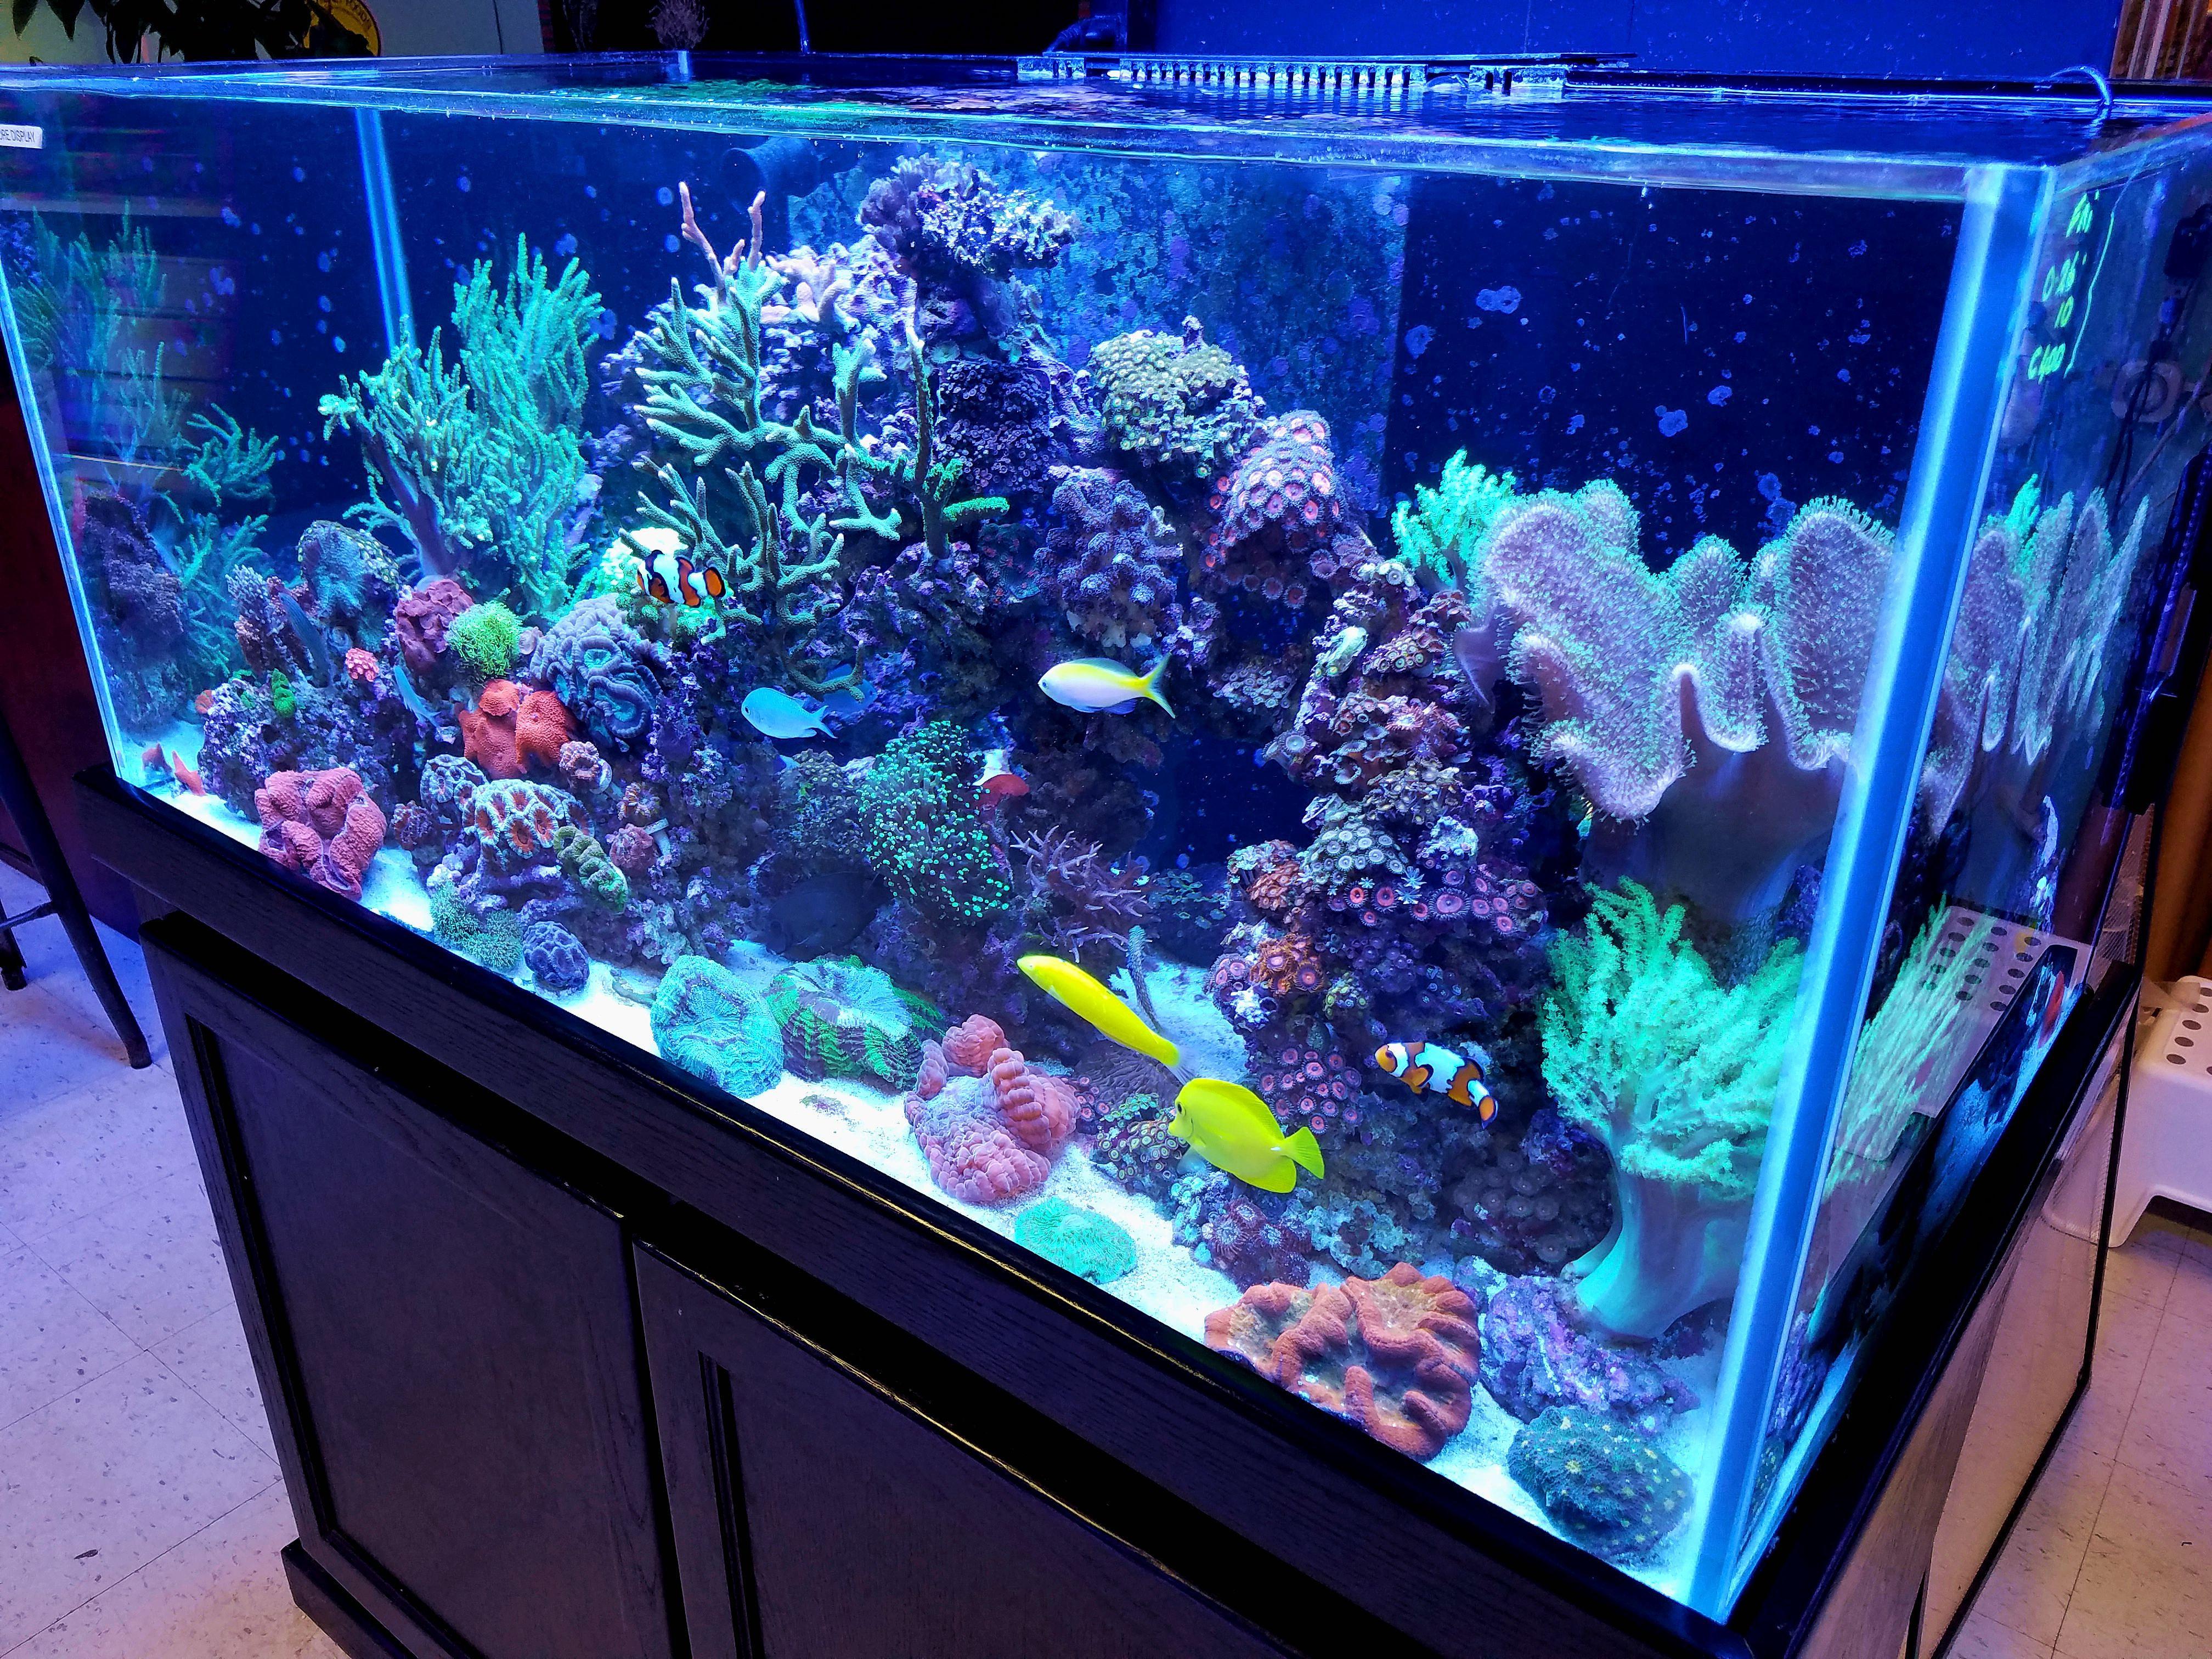 Freshwater fish store near me - 20160916_181356